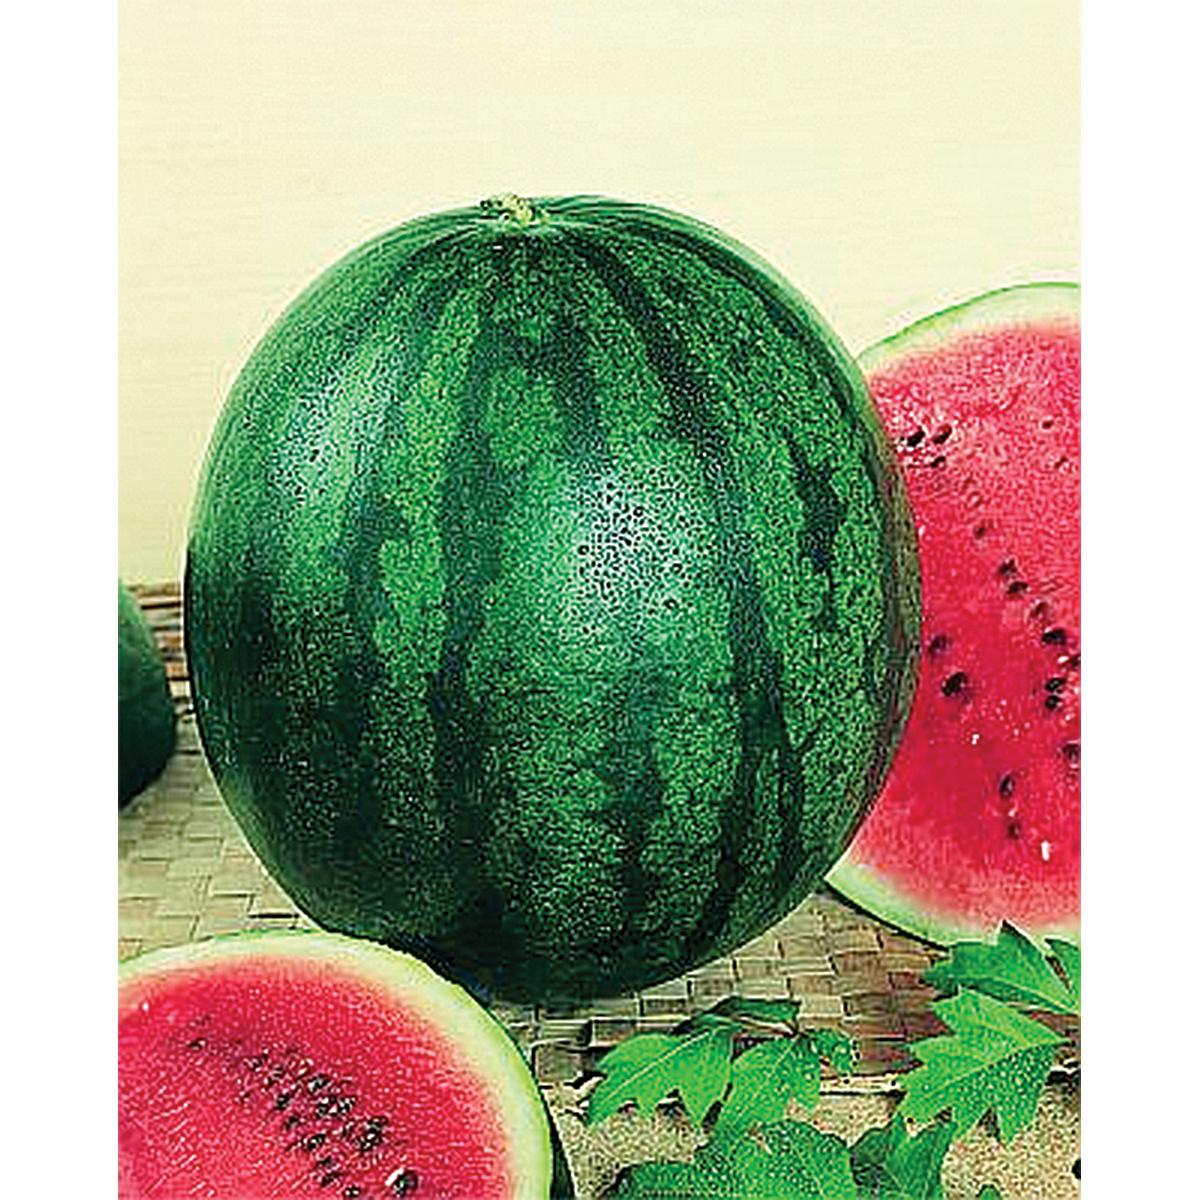 Bush Sugar Baby Watermelon Seeds Ne Seed